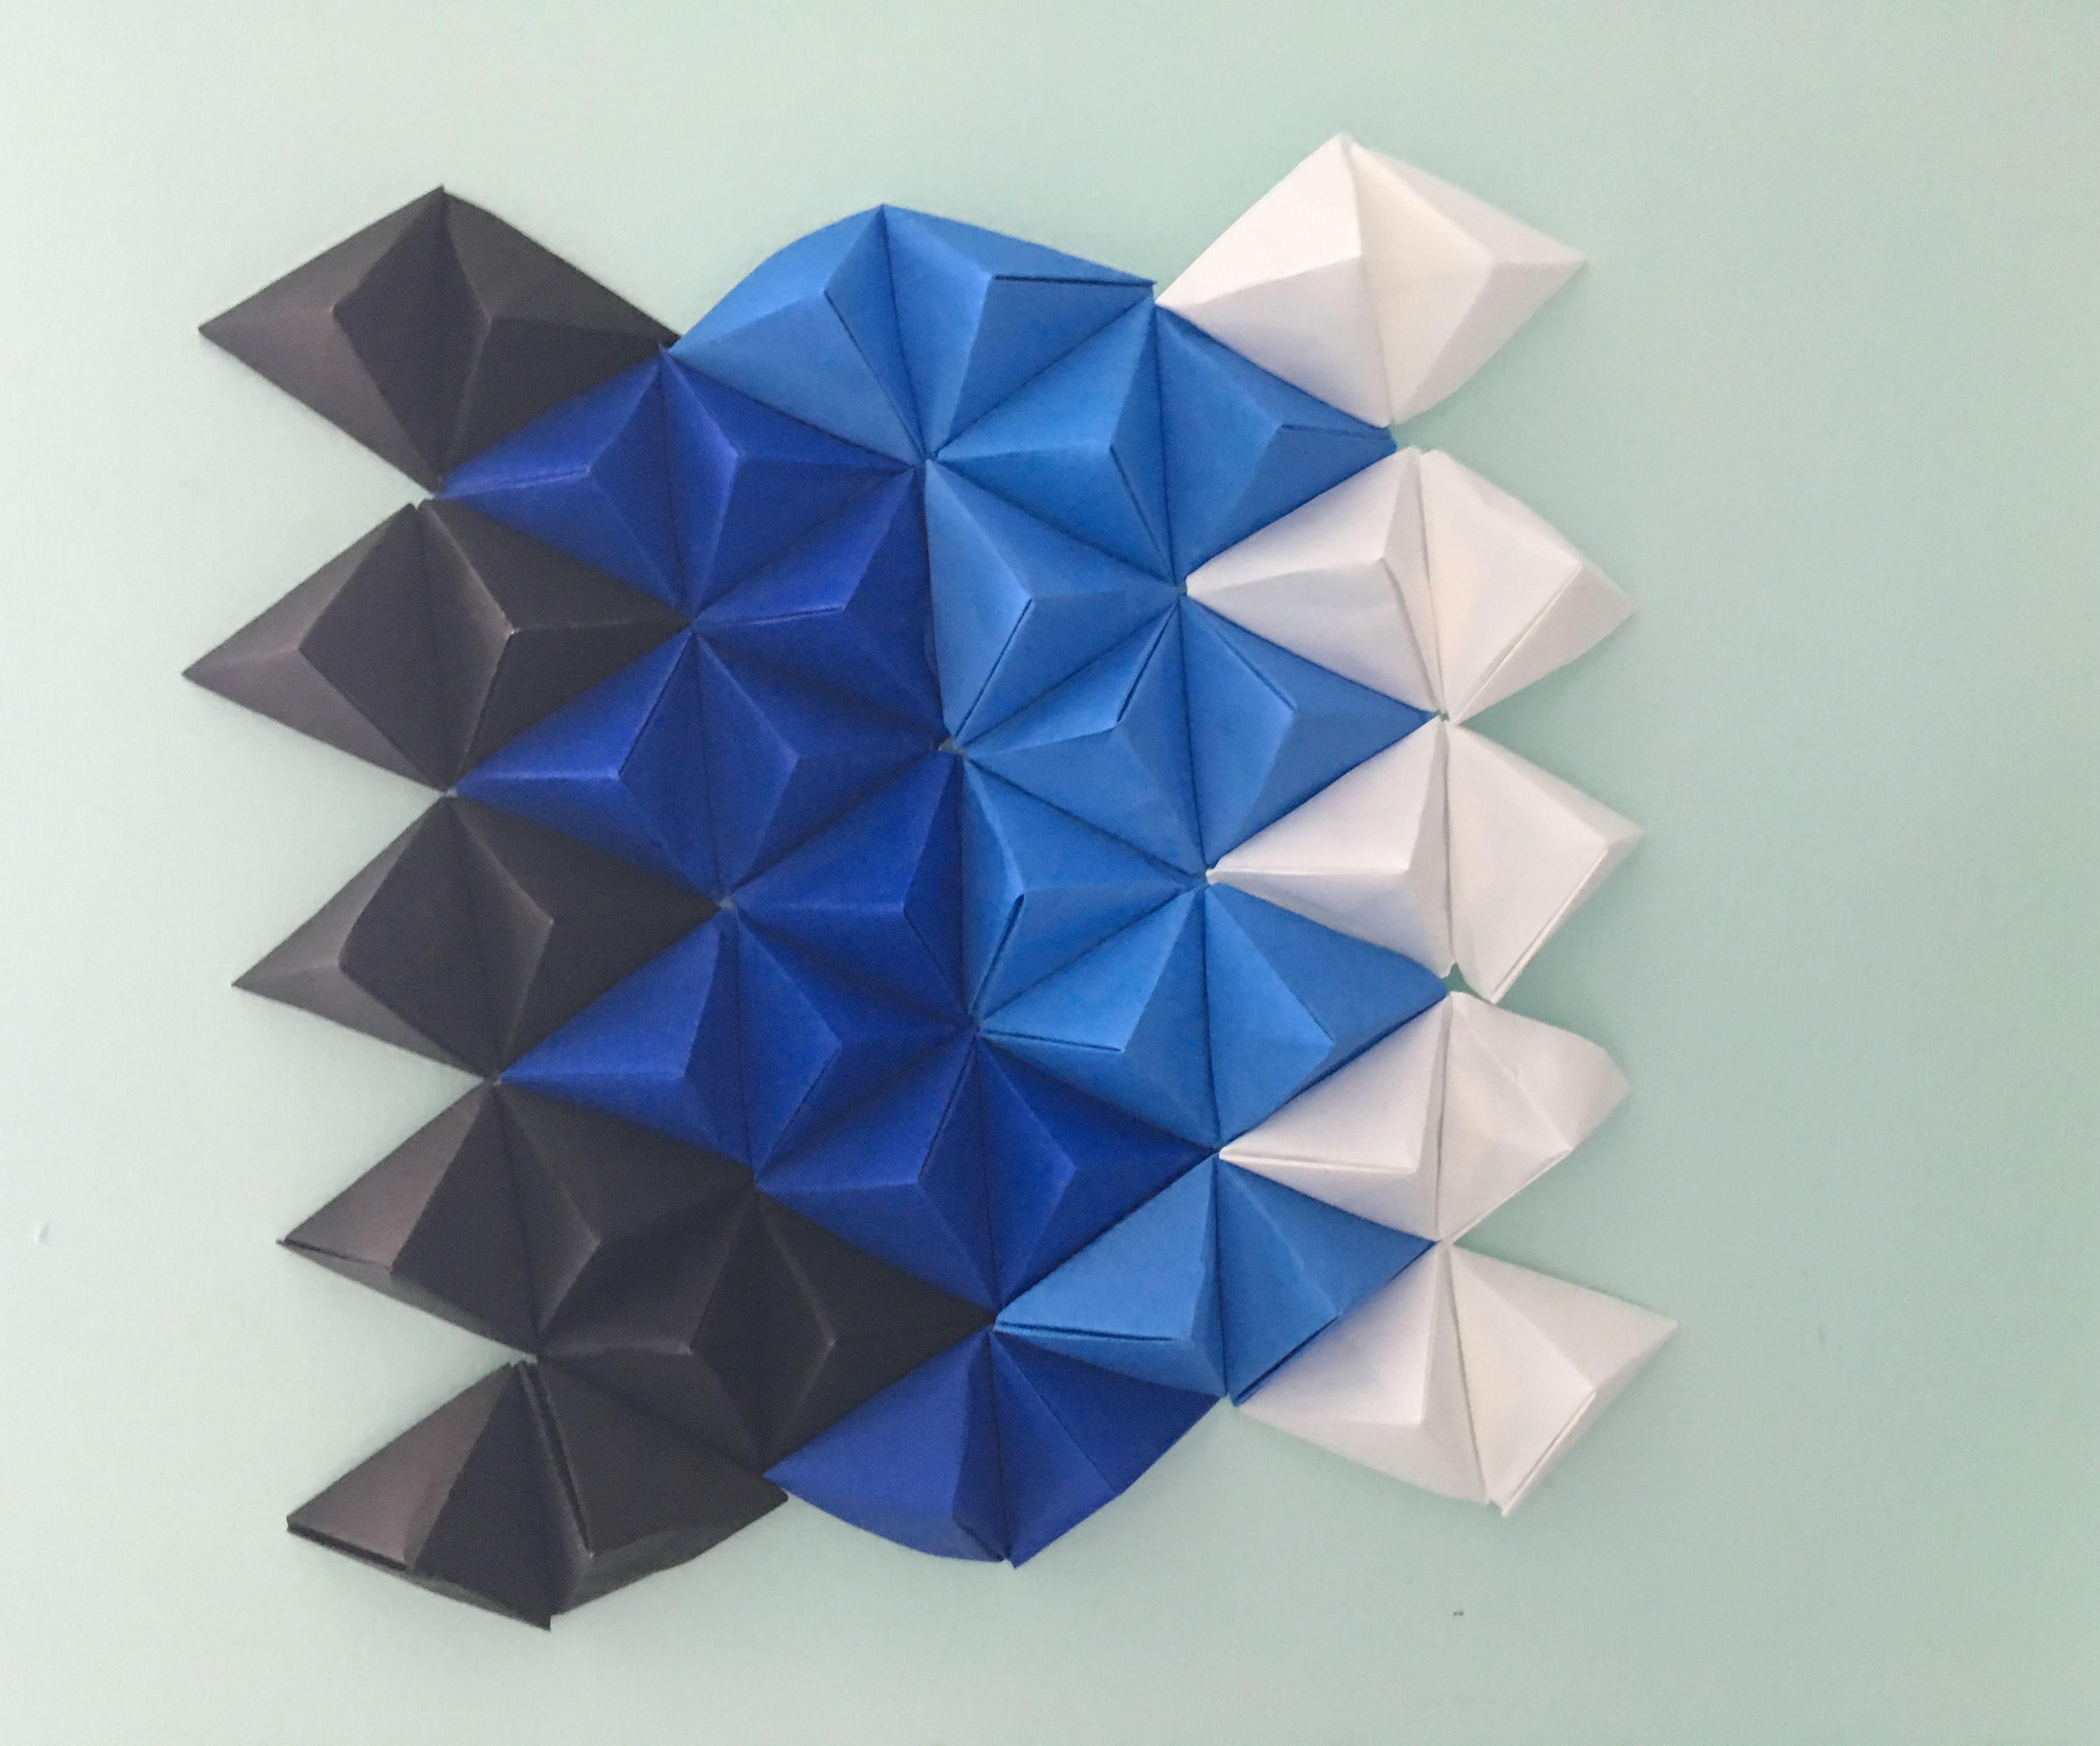 3D Origami Wall Art   Triangle Pixel Art